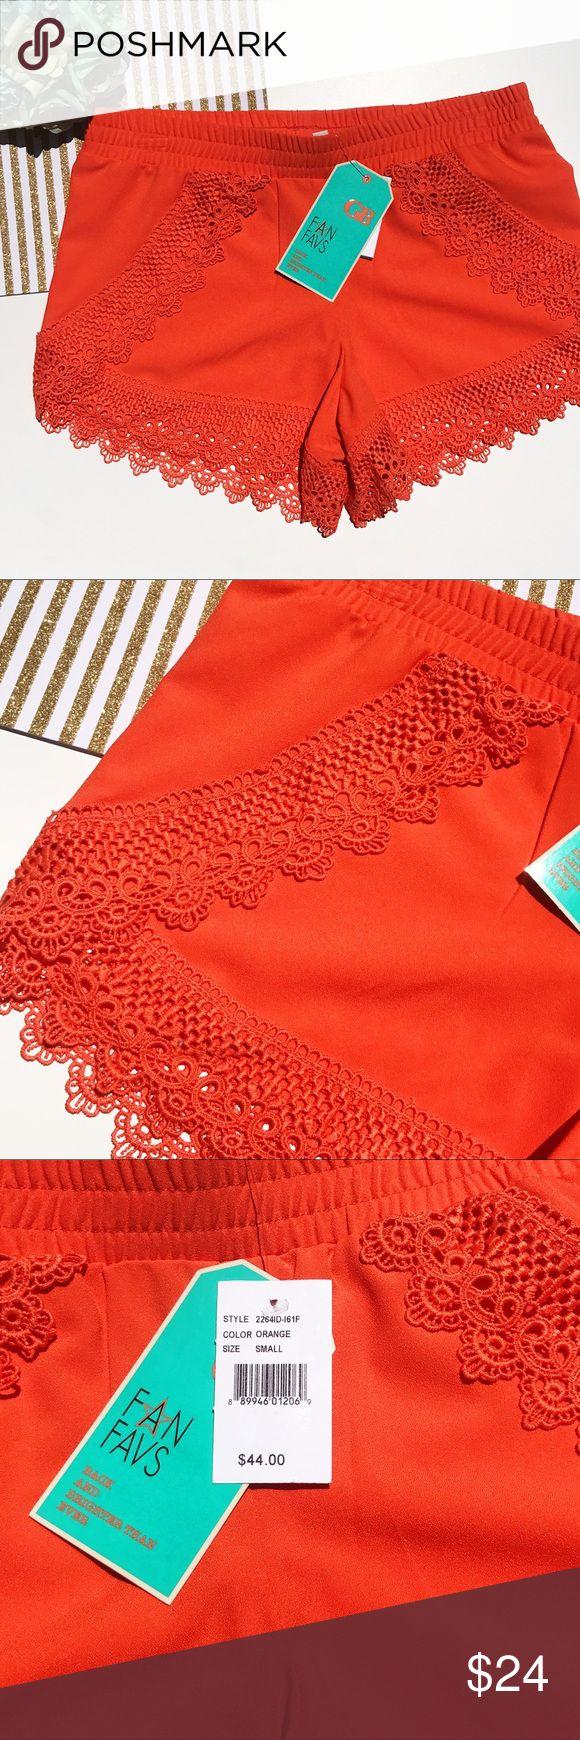 Gianni Bini bright orange short size small Brand new with tag Gianni Bini Shorts